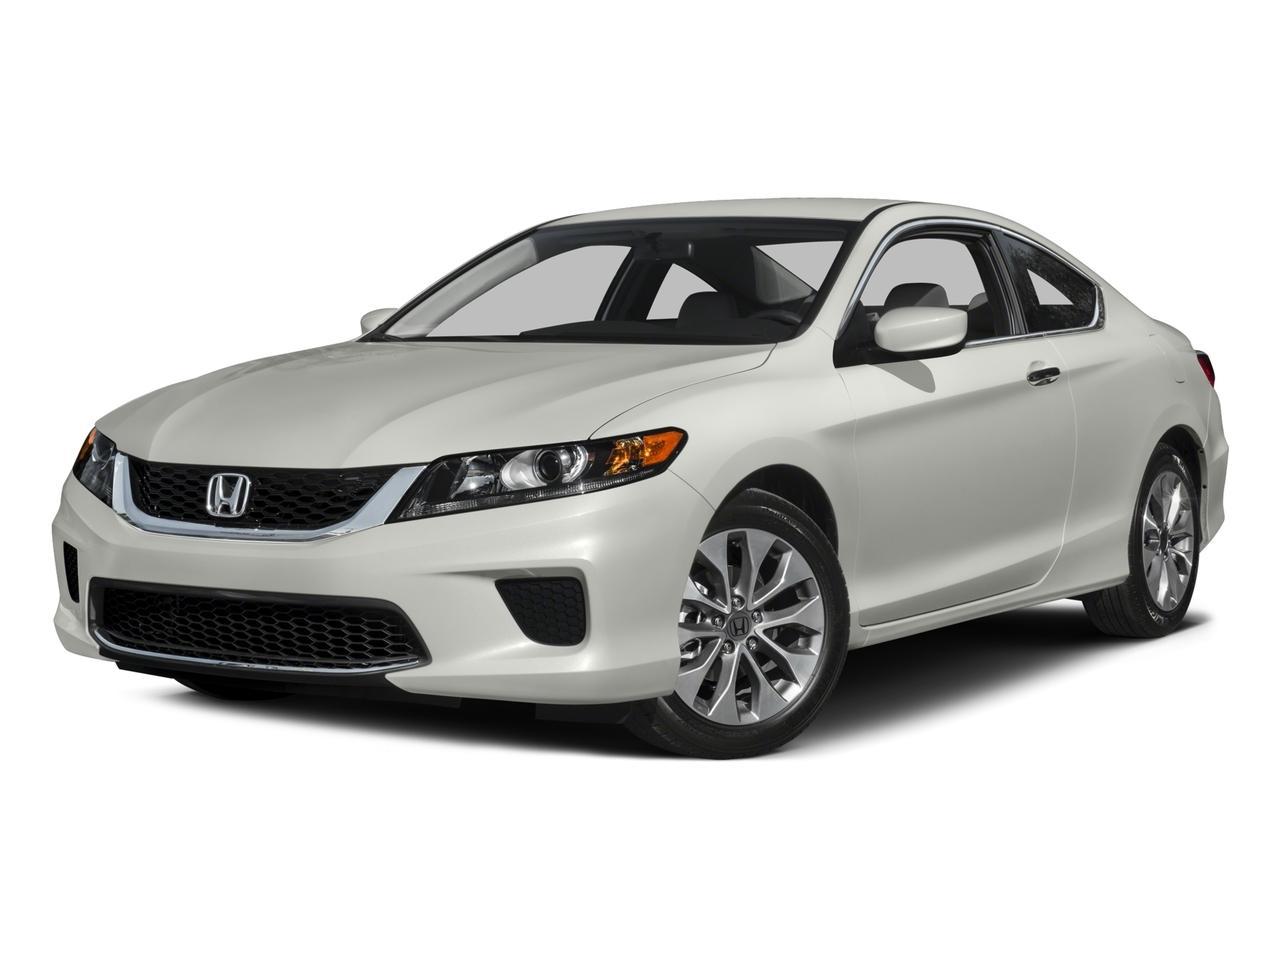 2015 Honda Accord Coupe Vehicle Photo in San Antonio, TX 78238